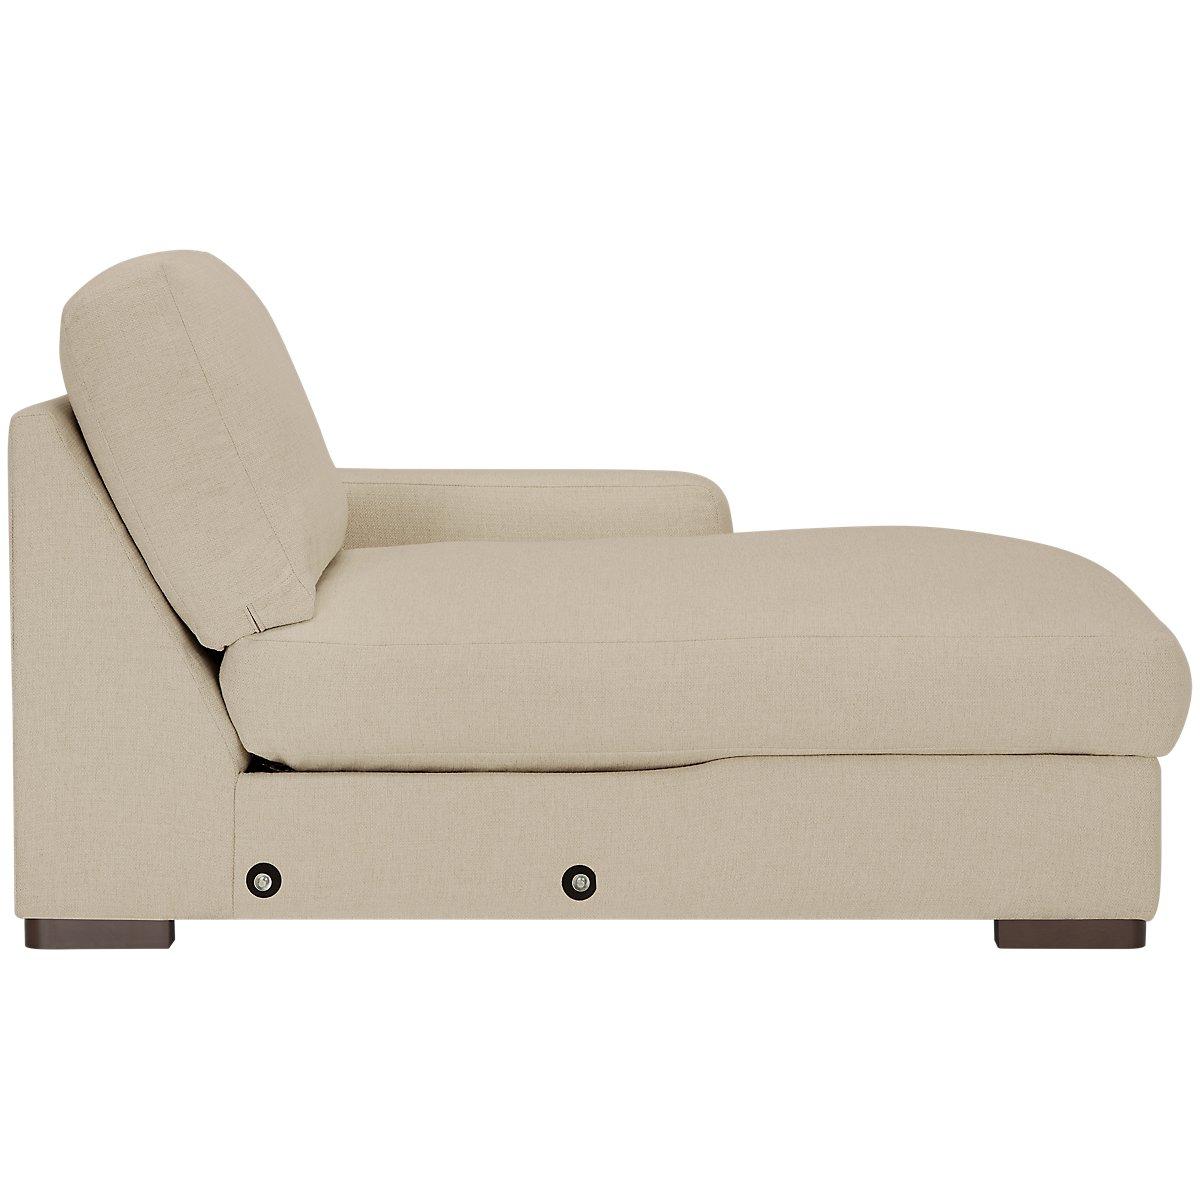 City furniture veronica khaki down large right chaise for Chaise kaki